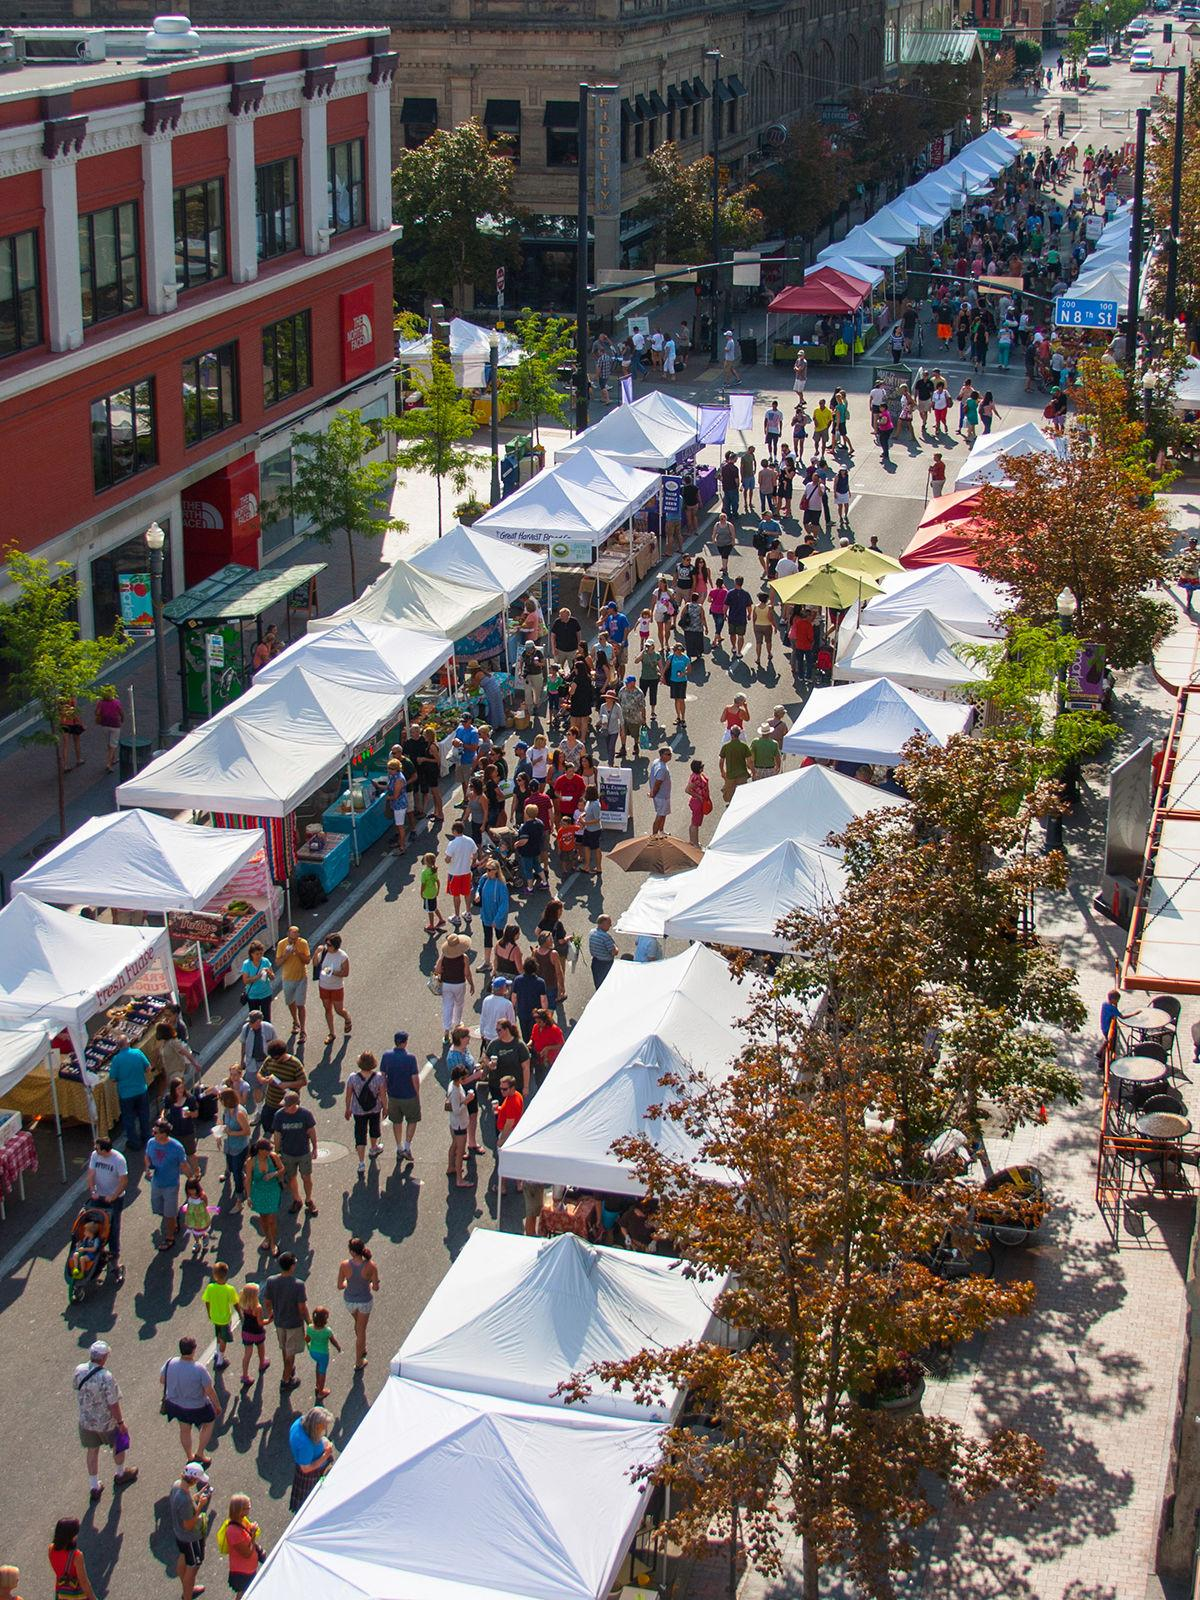 Three Days in Boise / Capital City Public Market